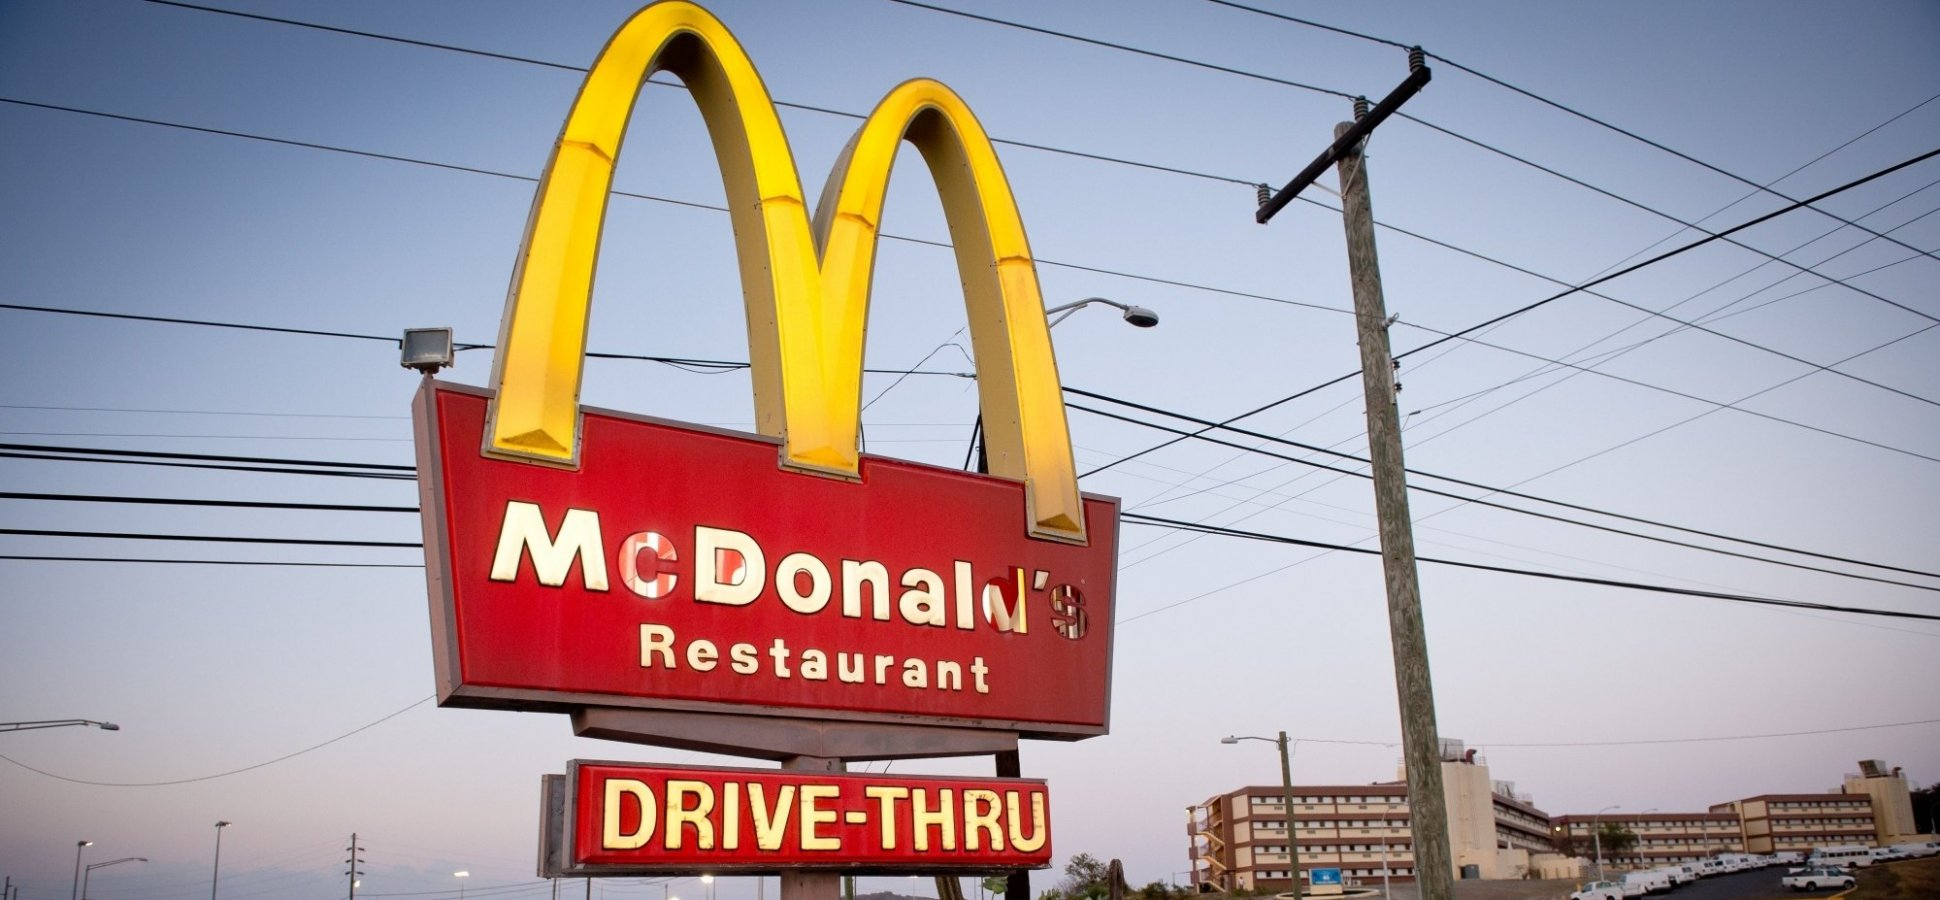 Why McDonald's Isn't Dead Yet